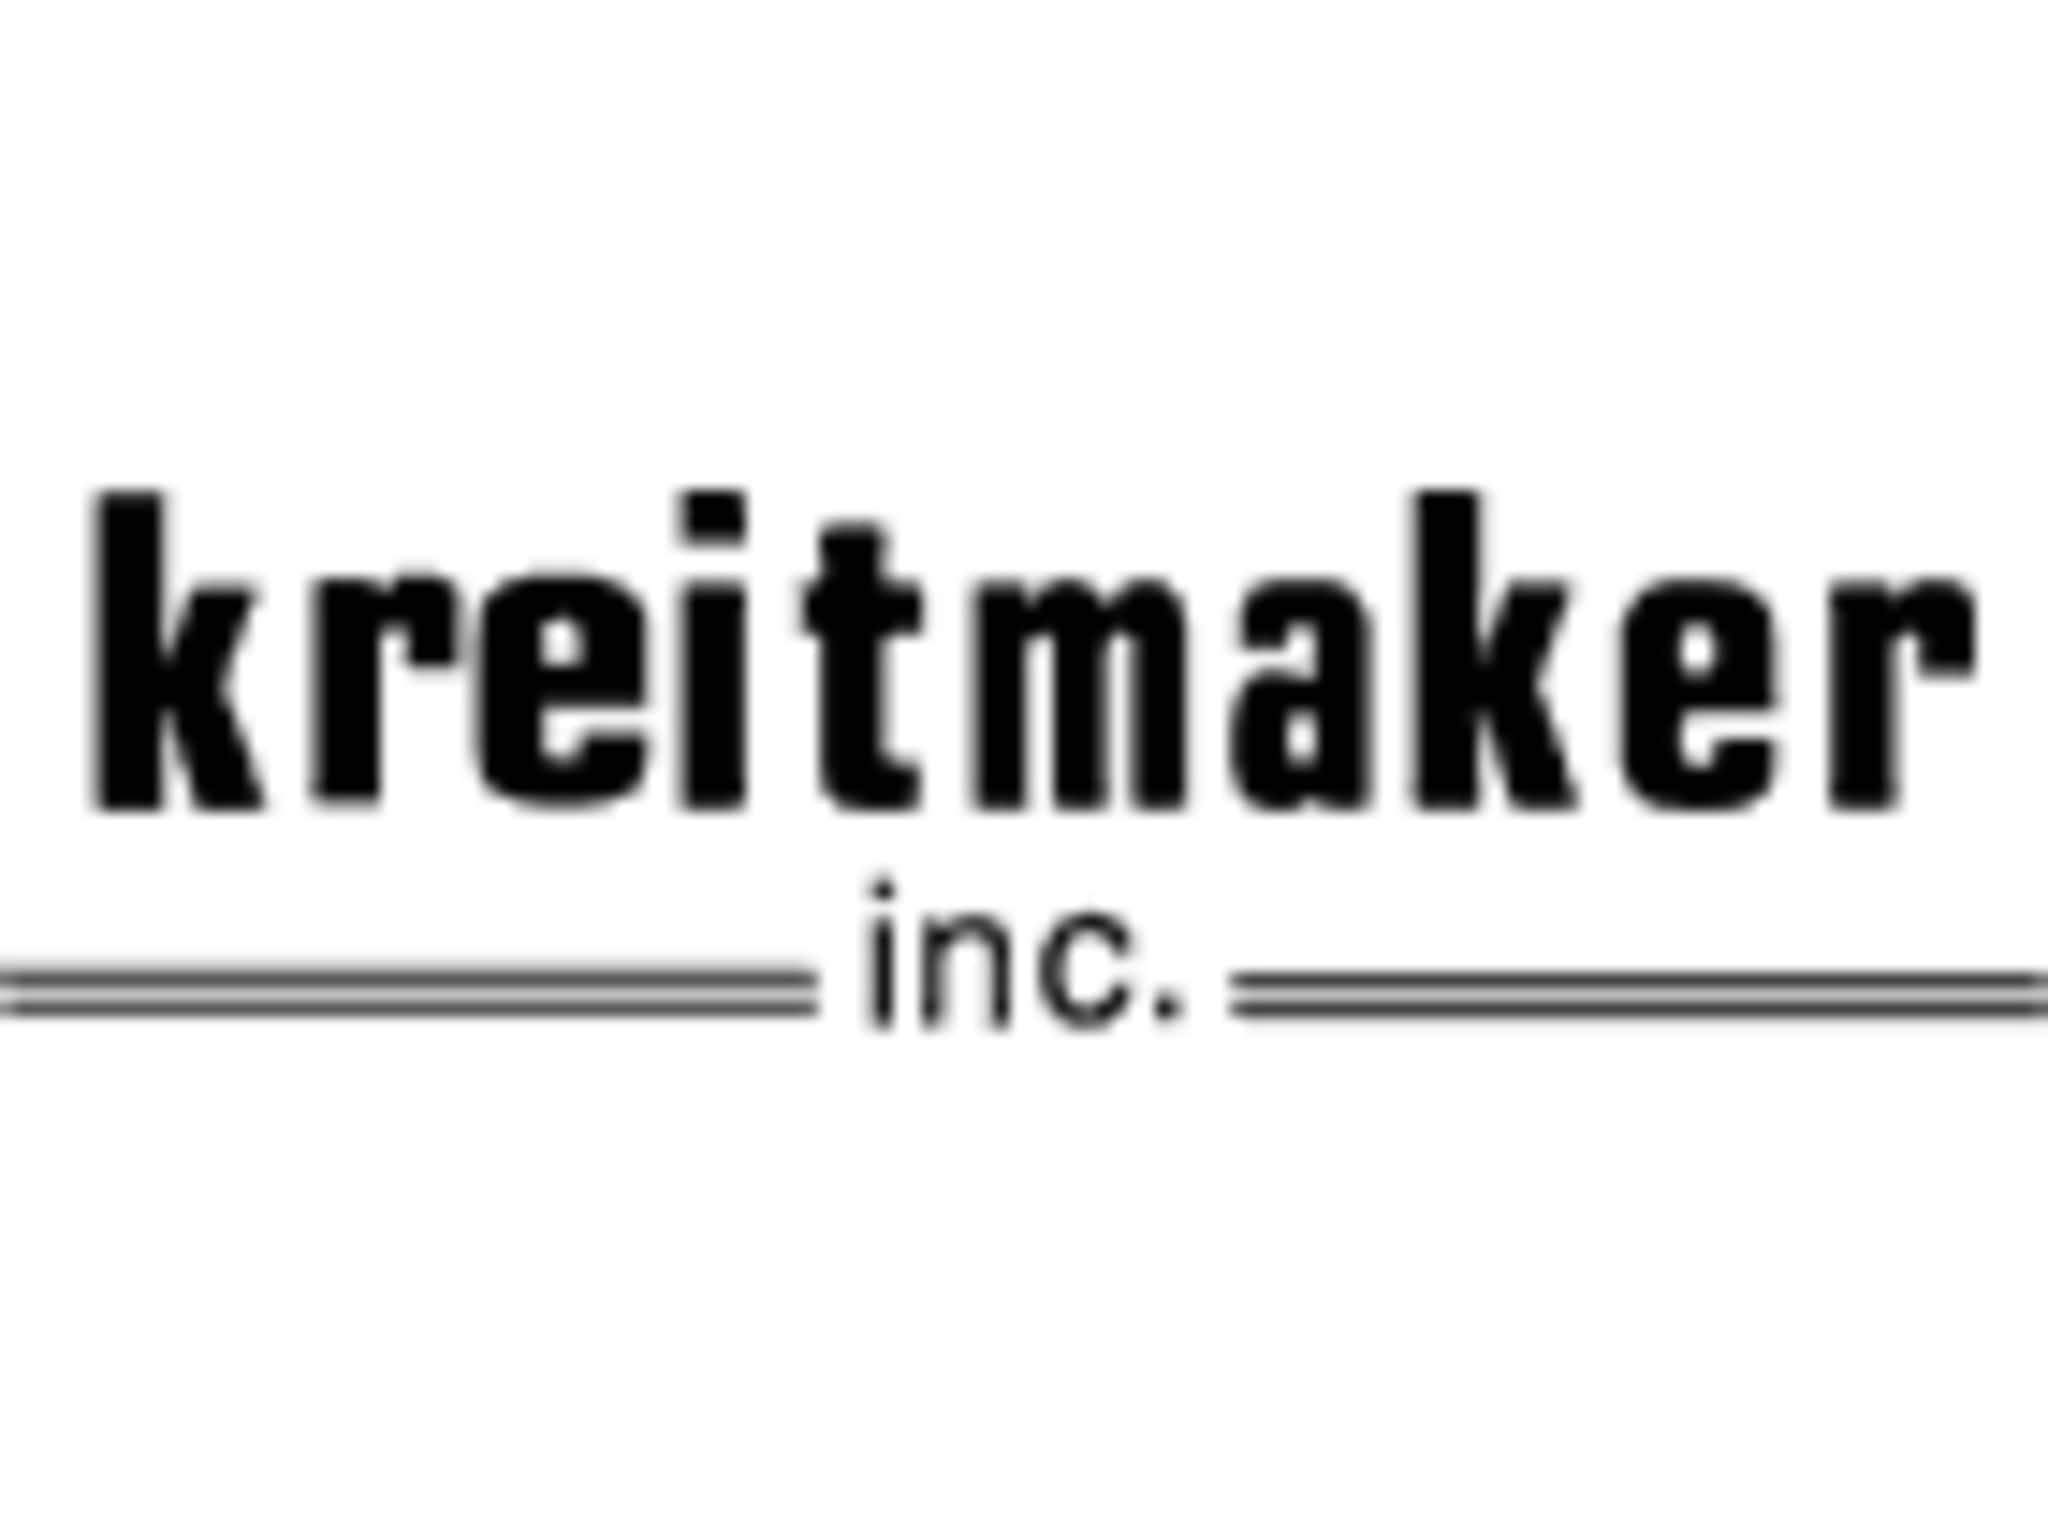 photo Kreitmaker Inc